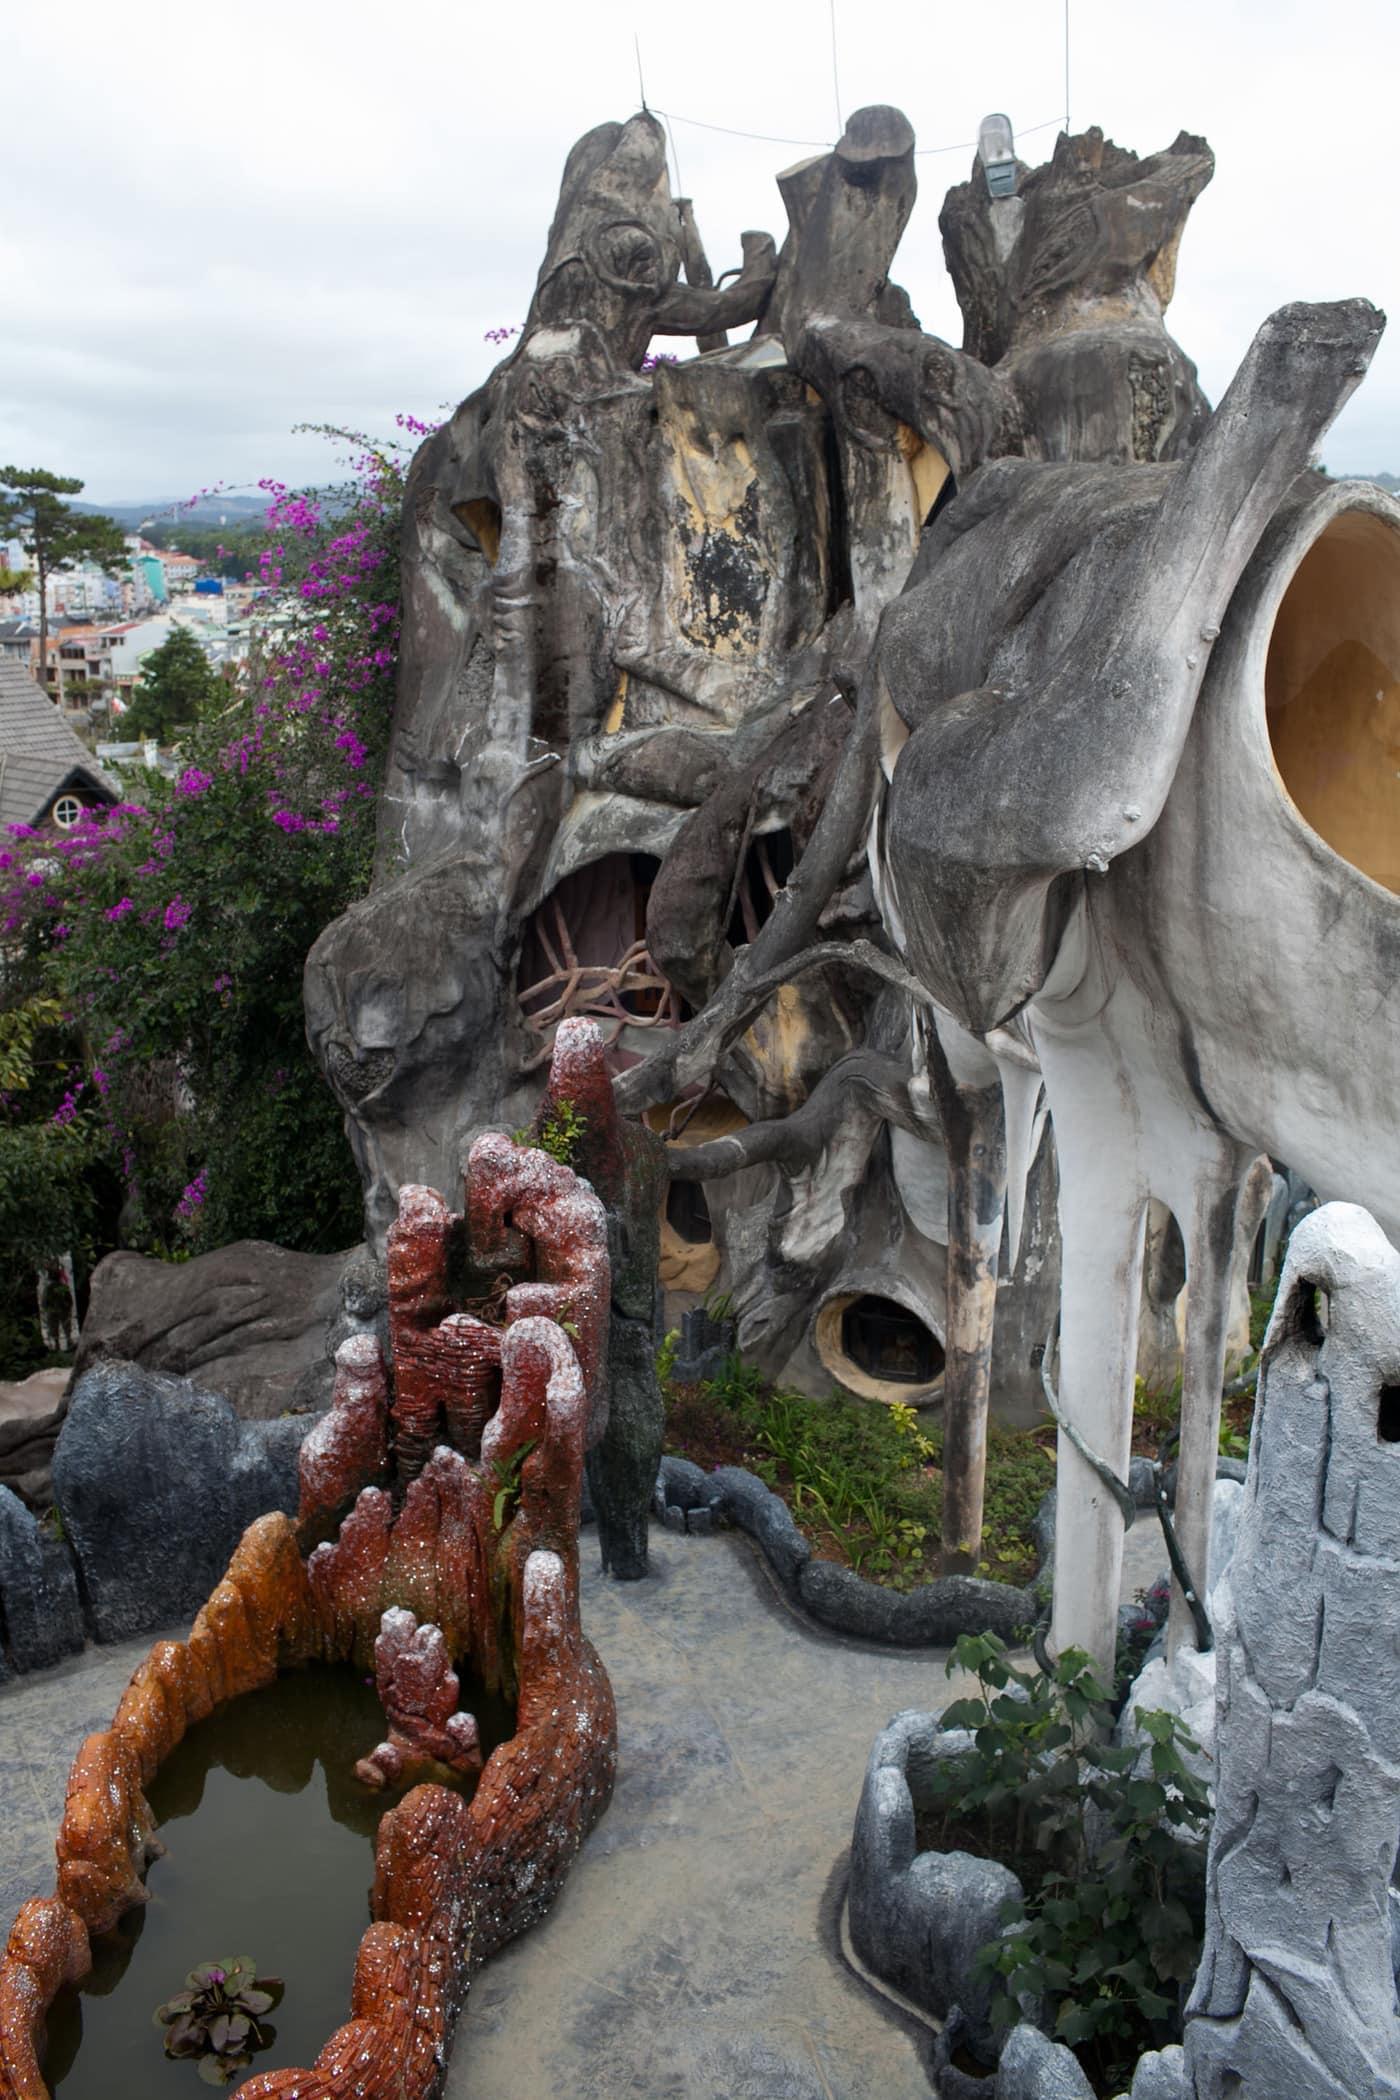 Crazy House in Dalat, Vietnam - Dalat Countryside Tour in Vietnam